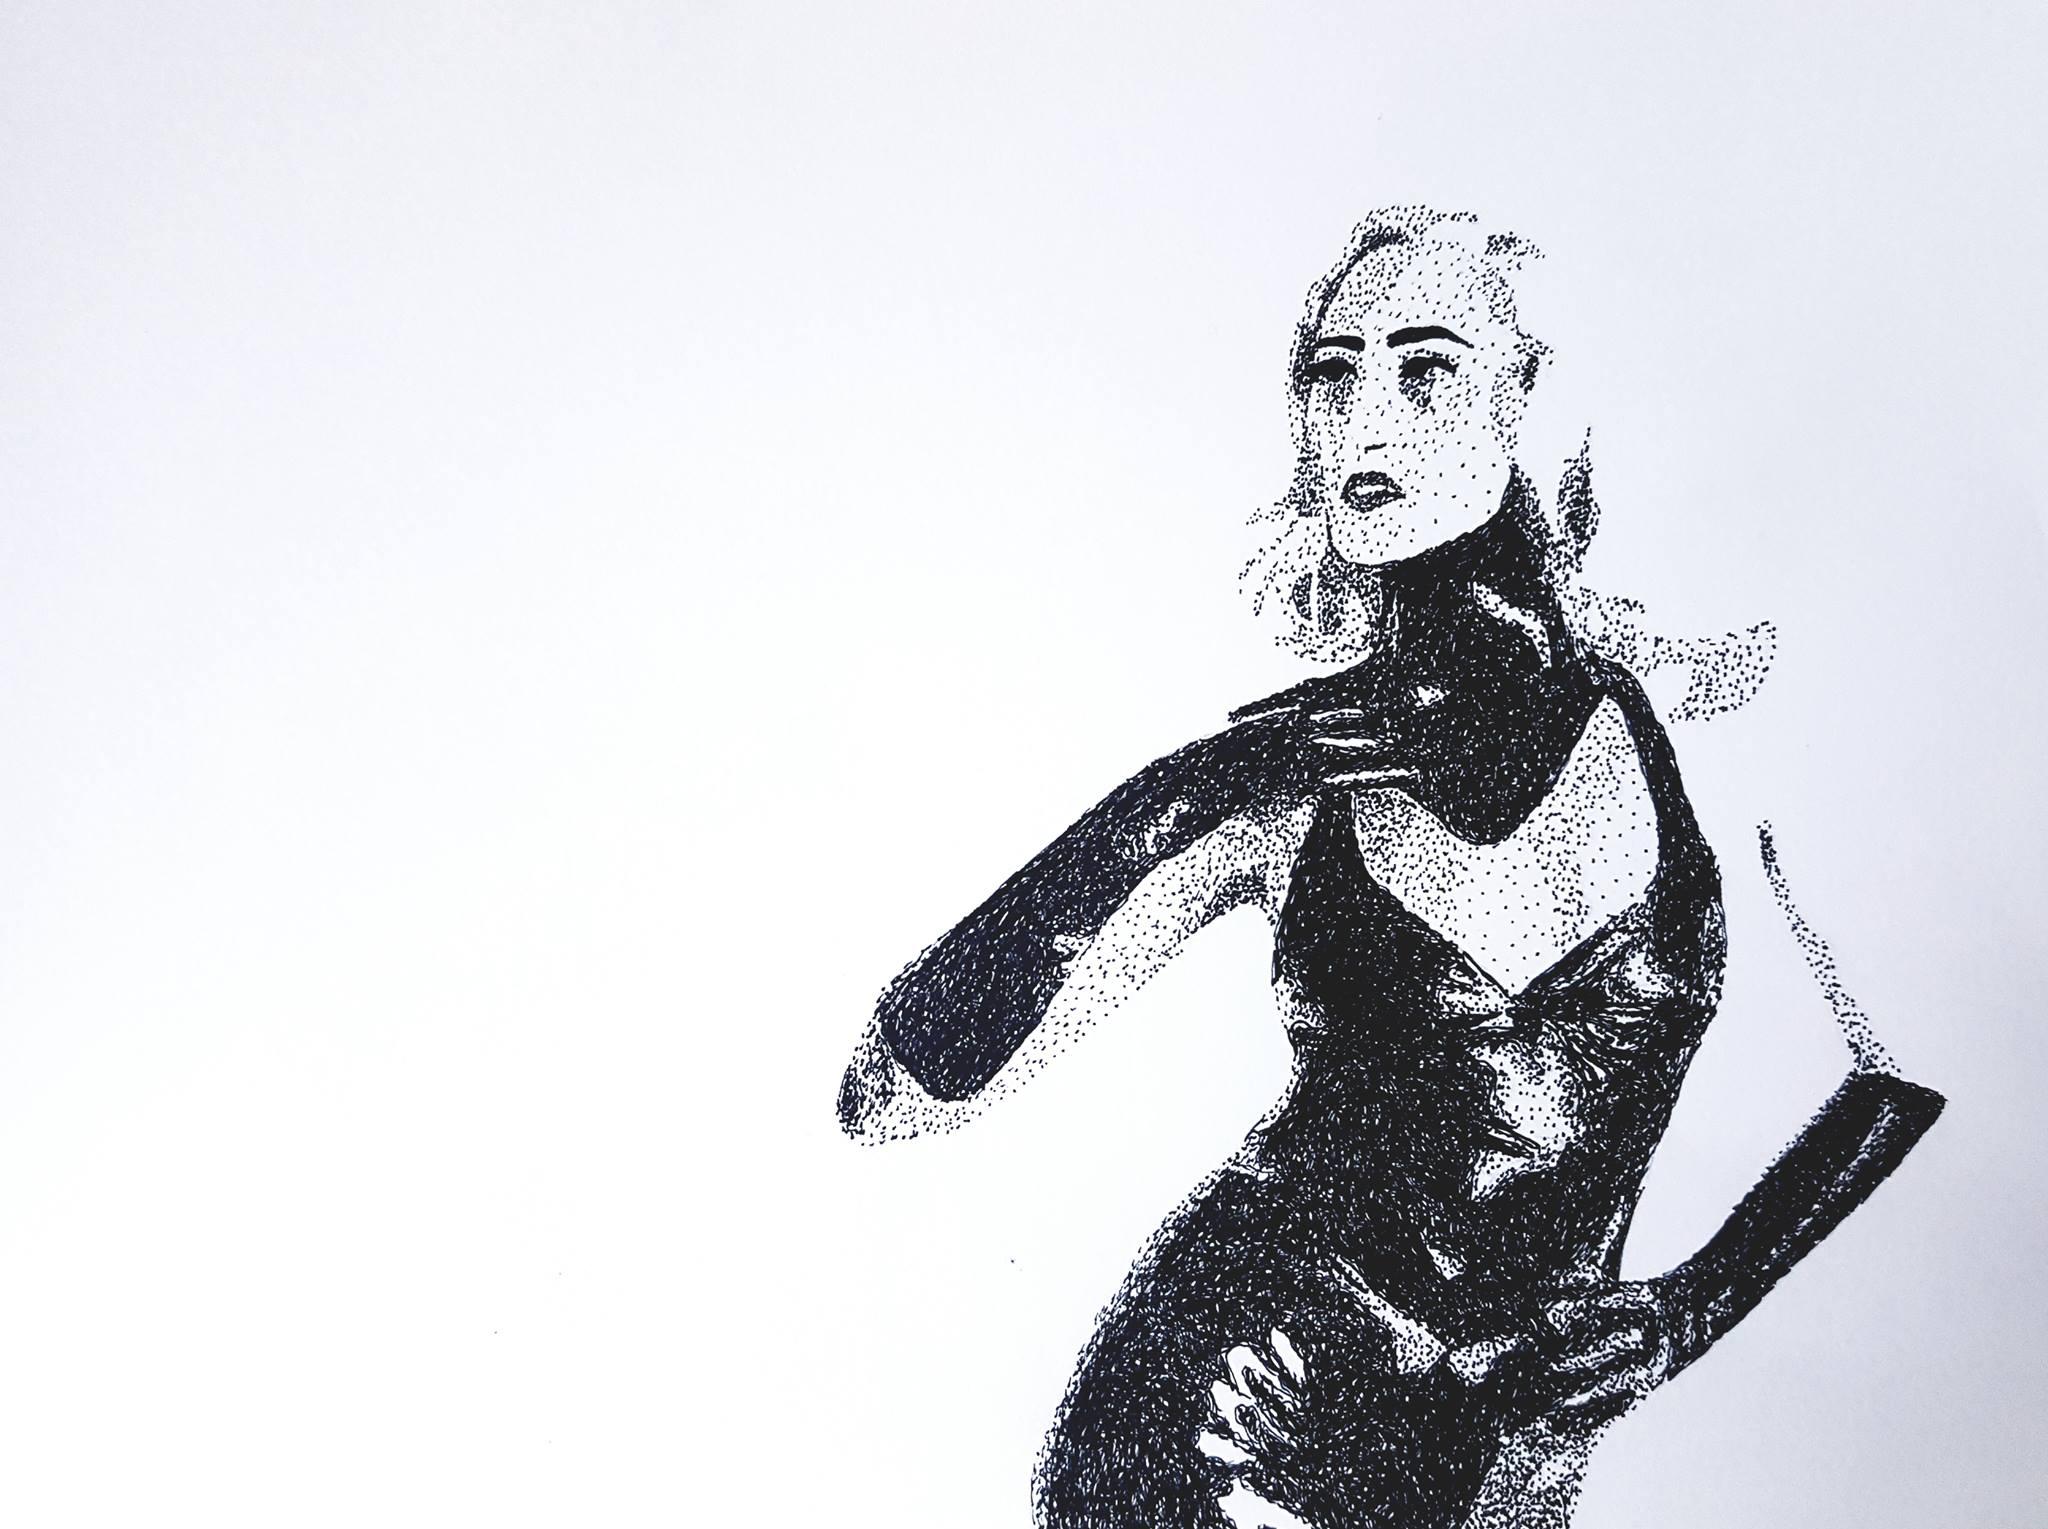 Essie Foxglove by Sylvia Sippl